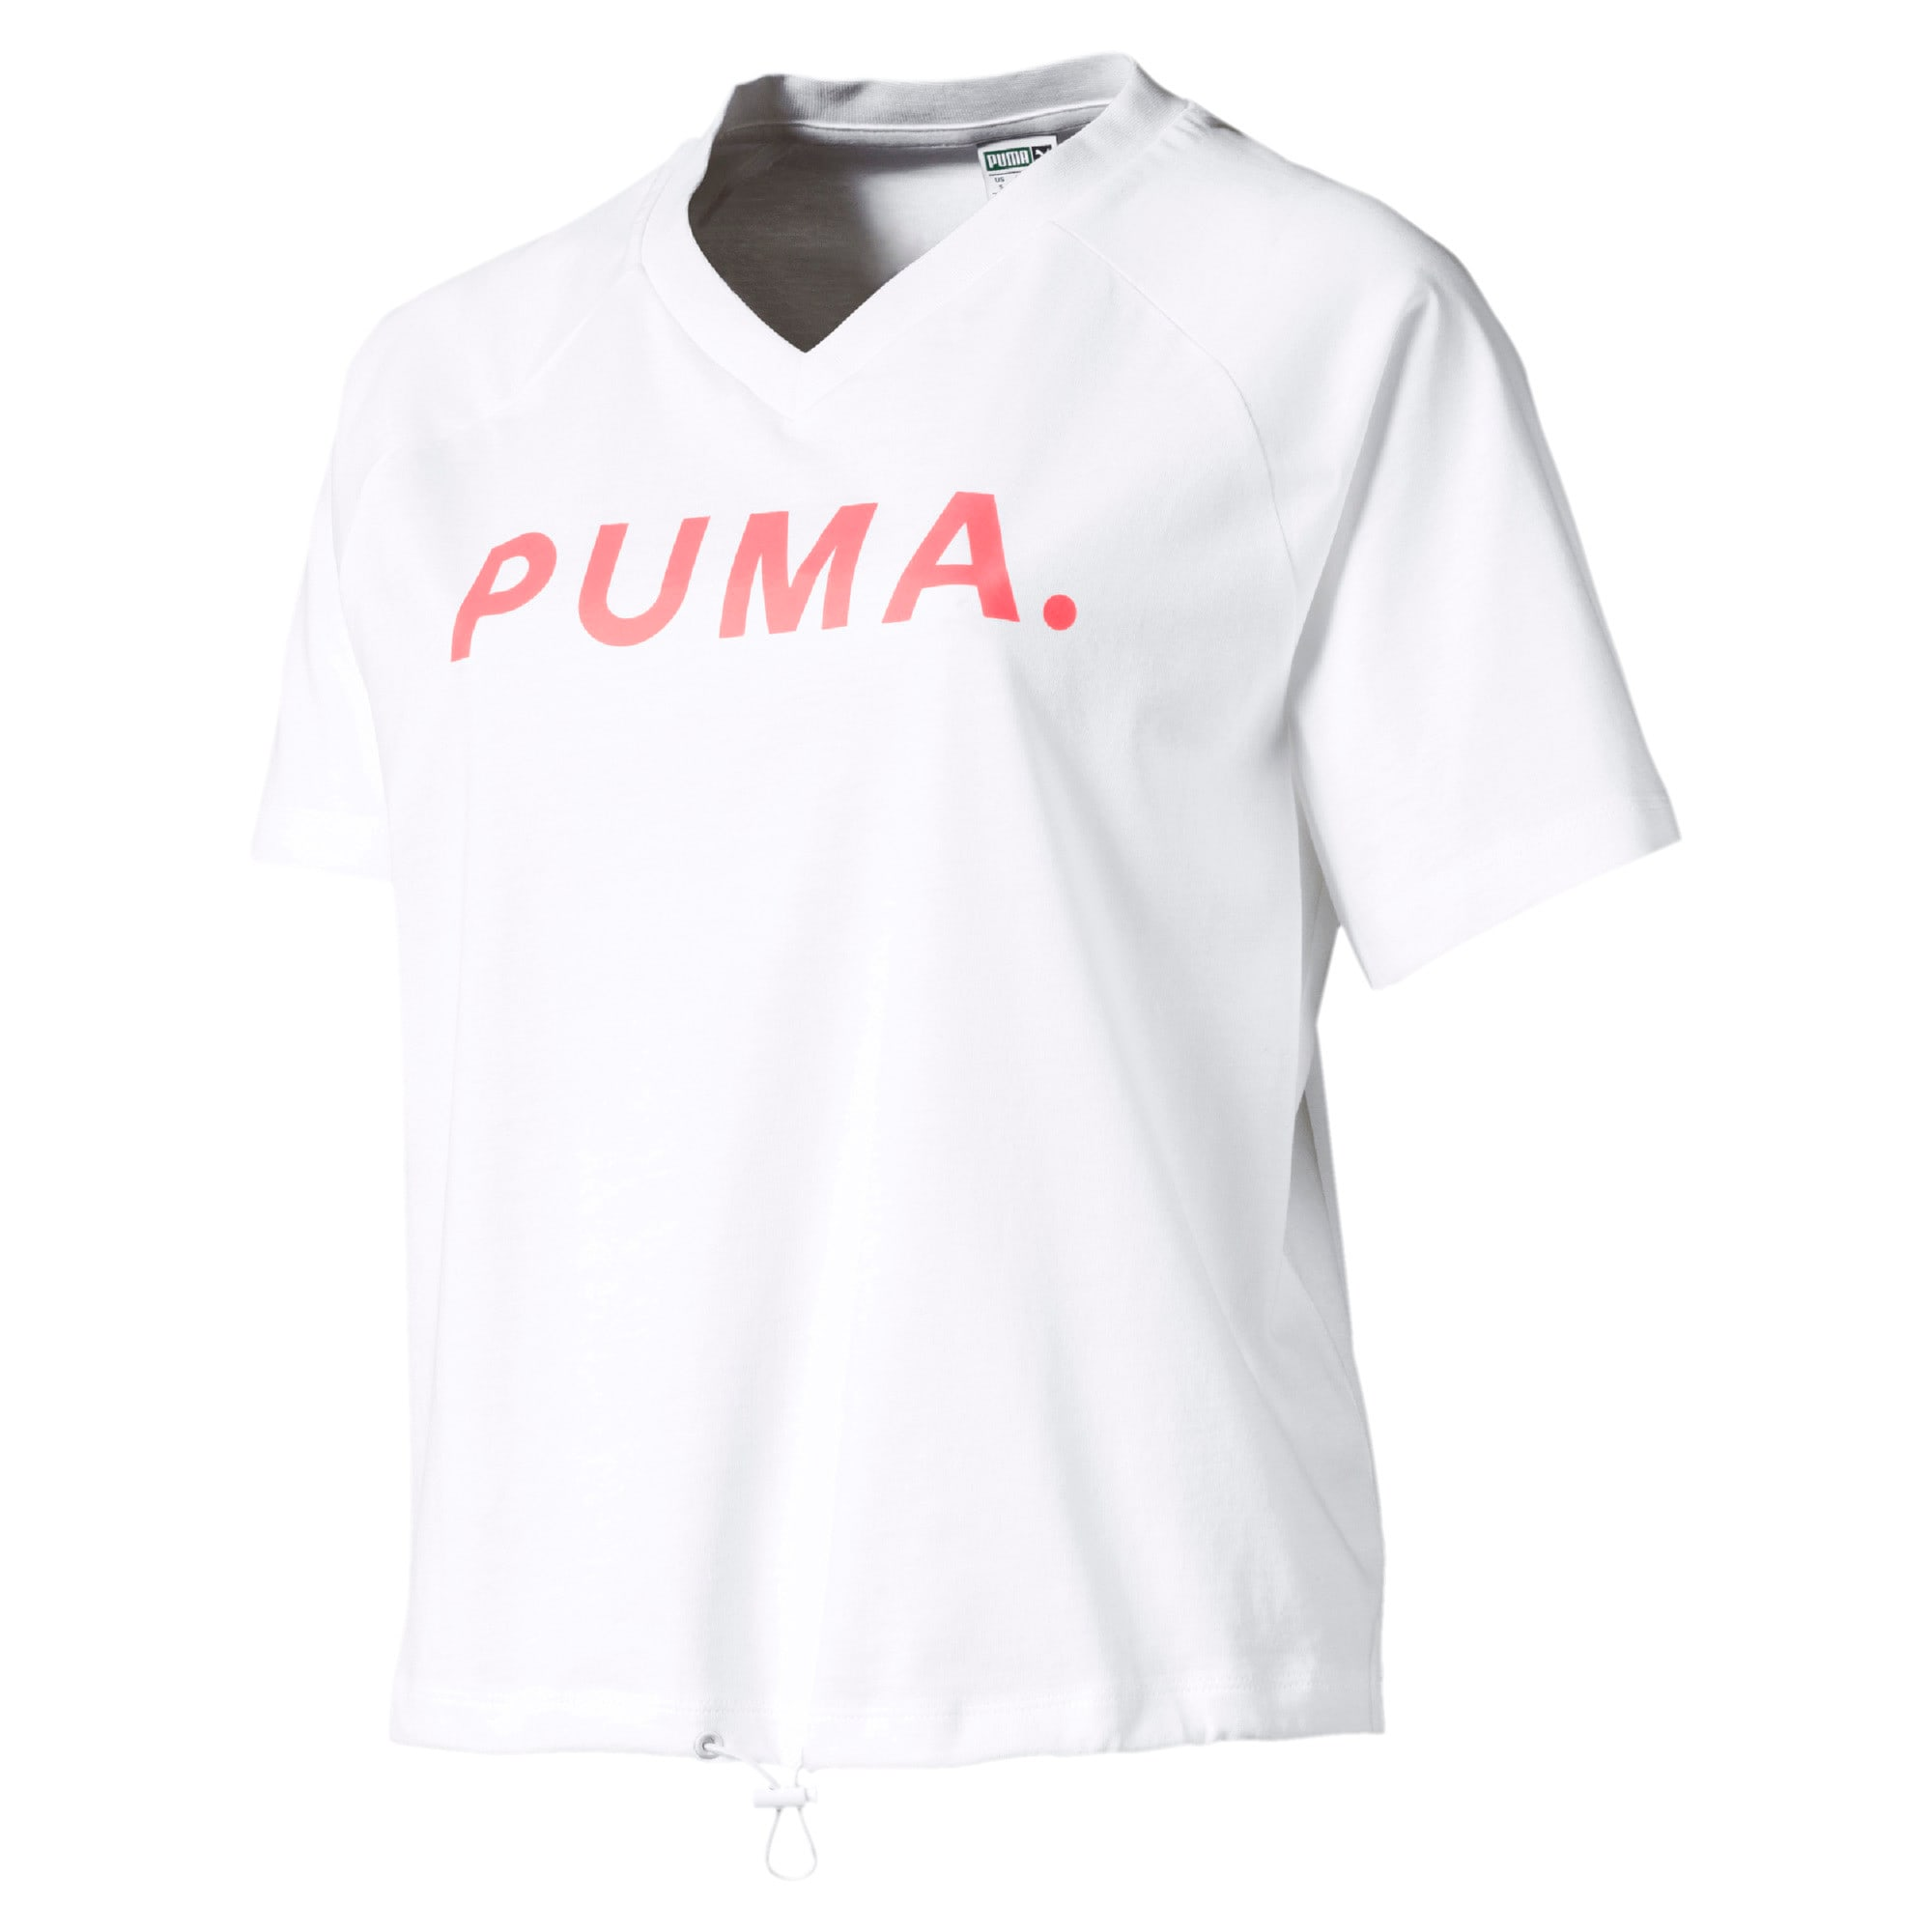 Thumbnail 1 of Chase Women's V-Neck Tee, Puma White, medium